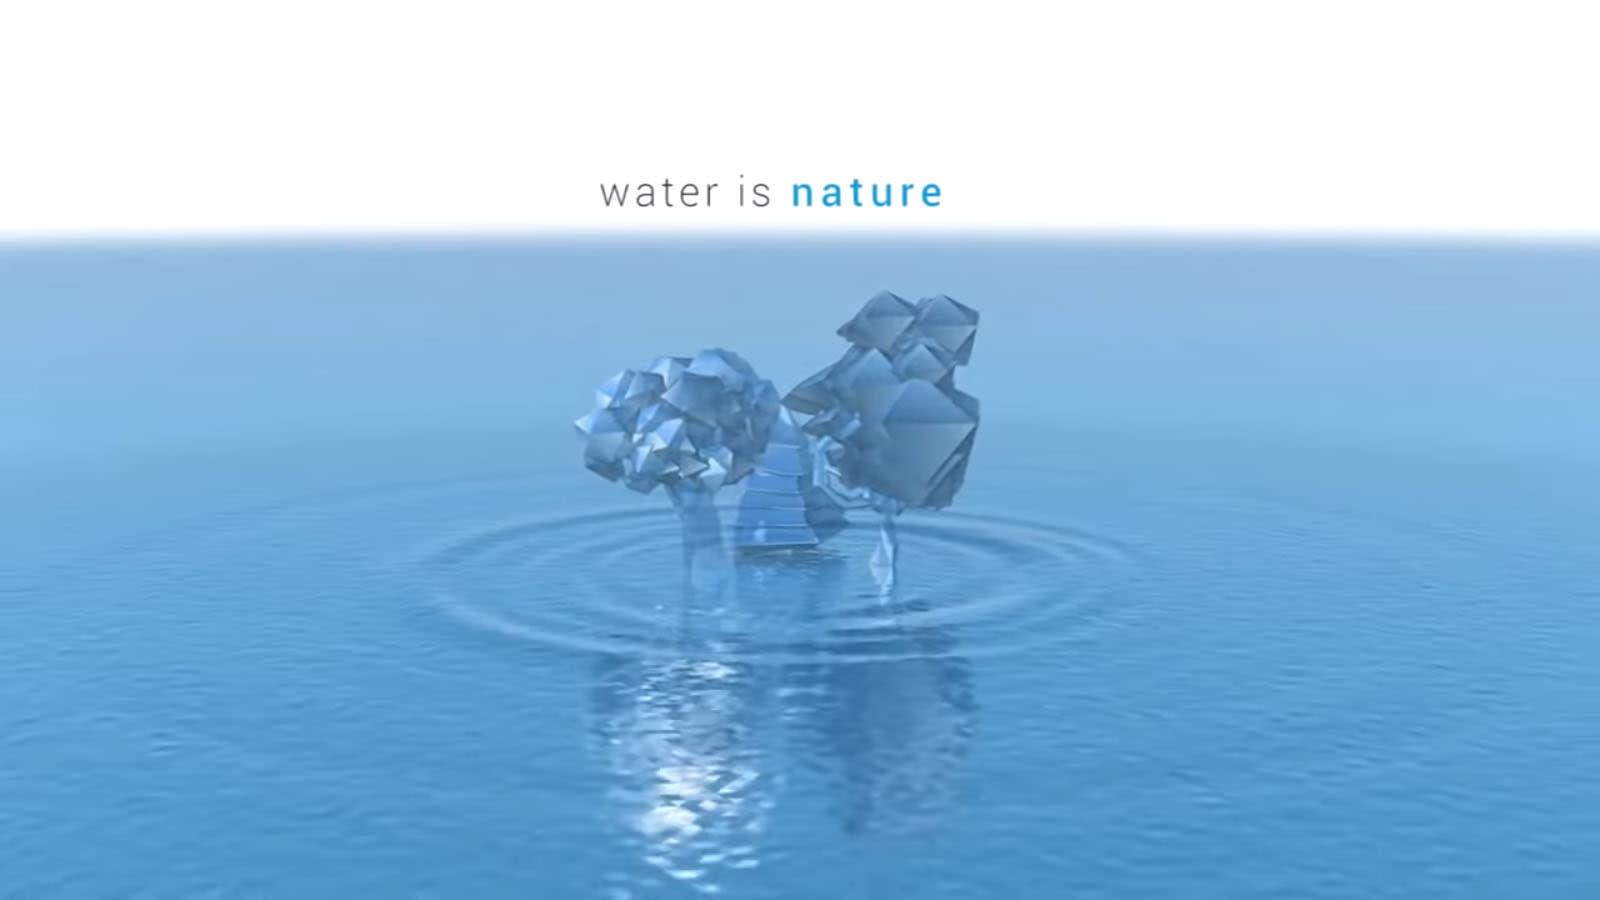 Március 22-e a Víz Világnapja